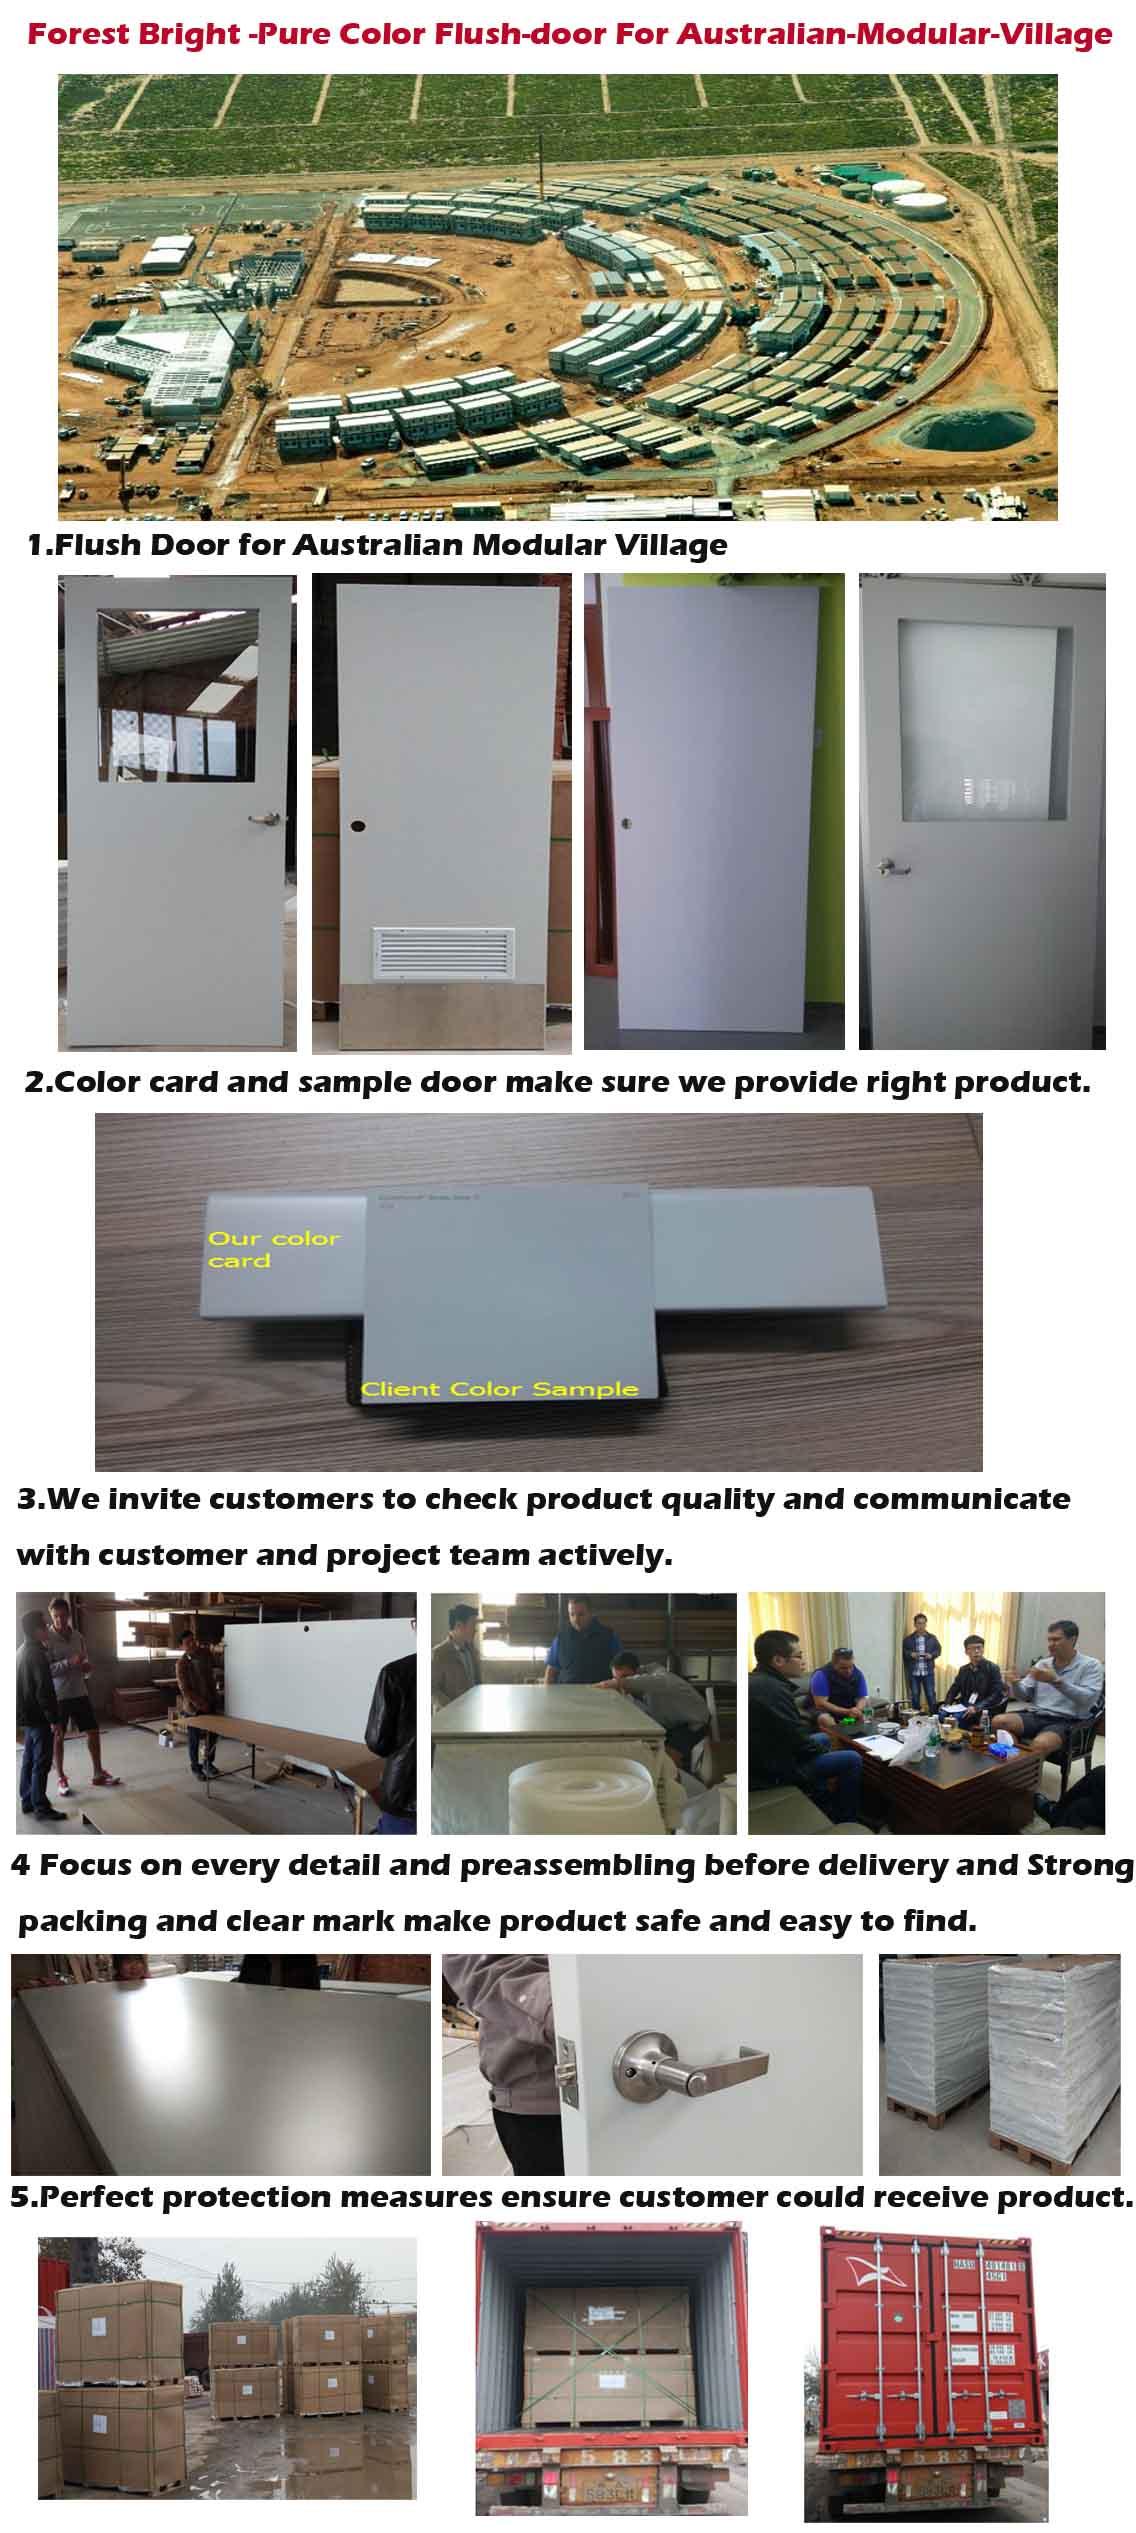 Forest Bright -Pure Color Flush-door for Australian-Modular-Village